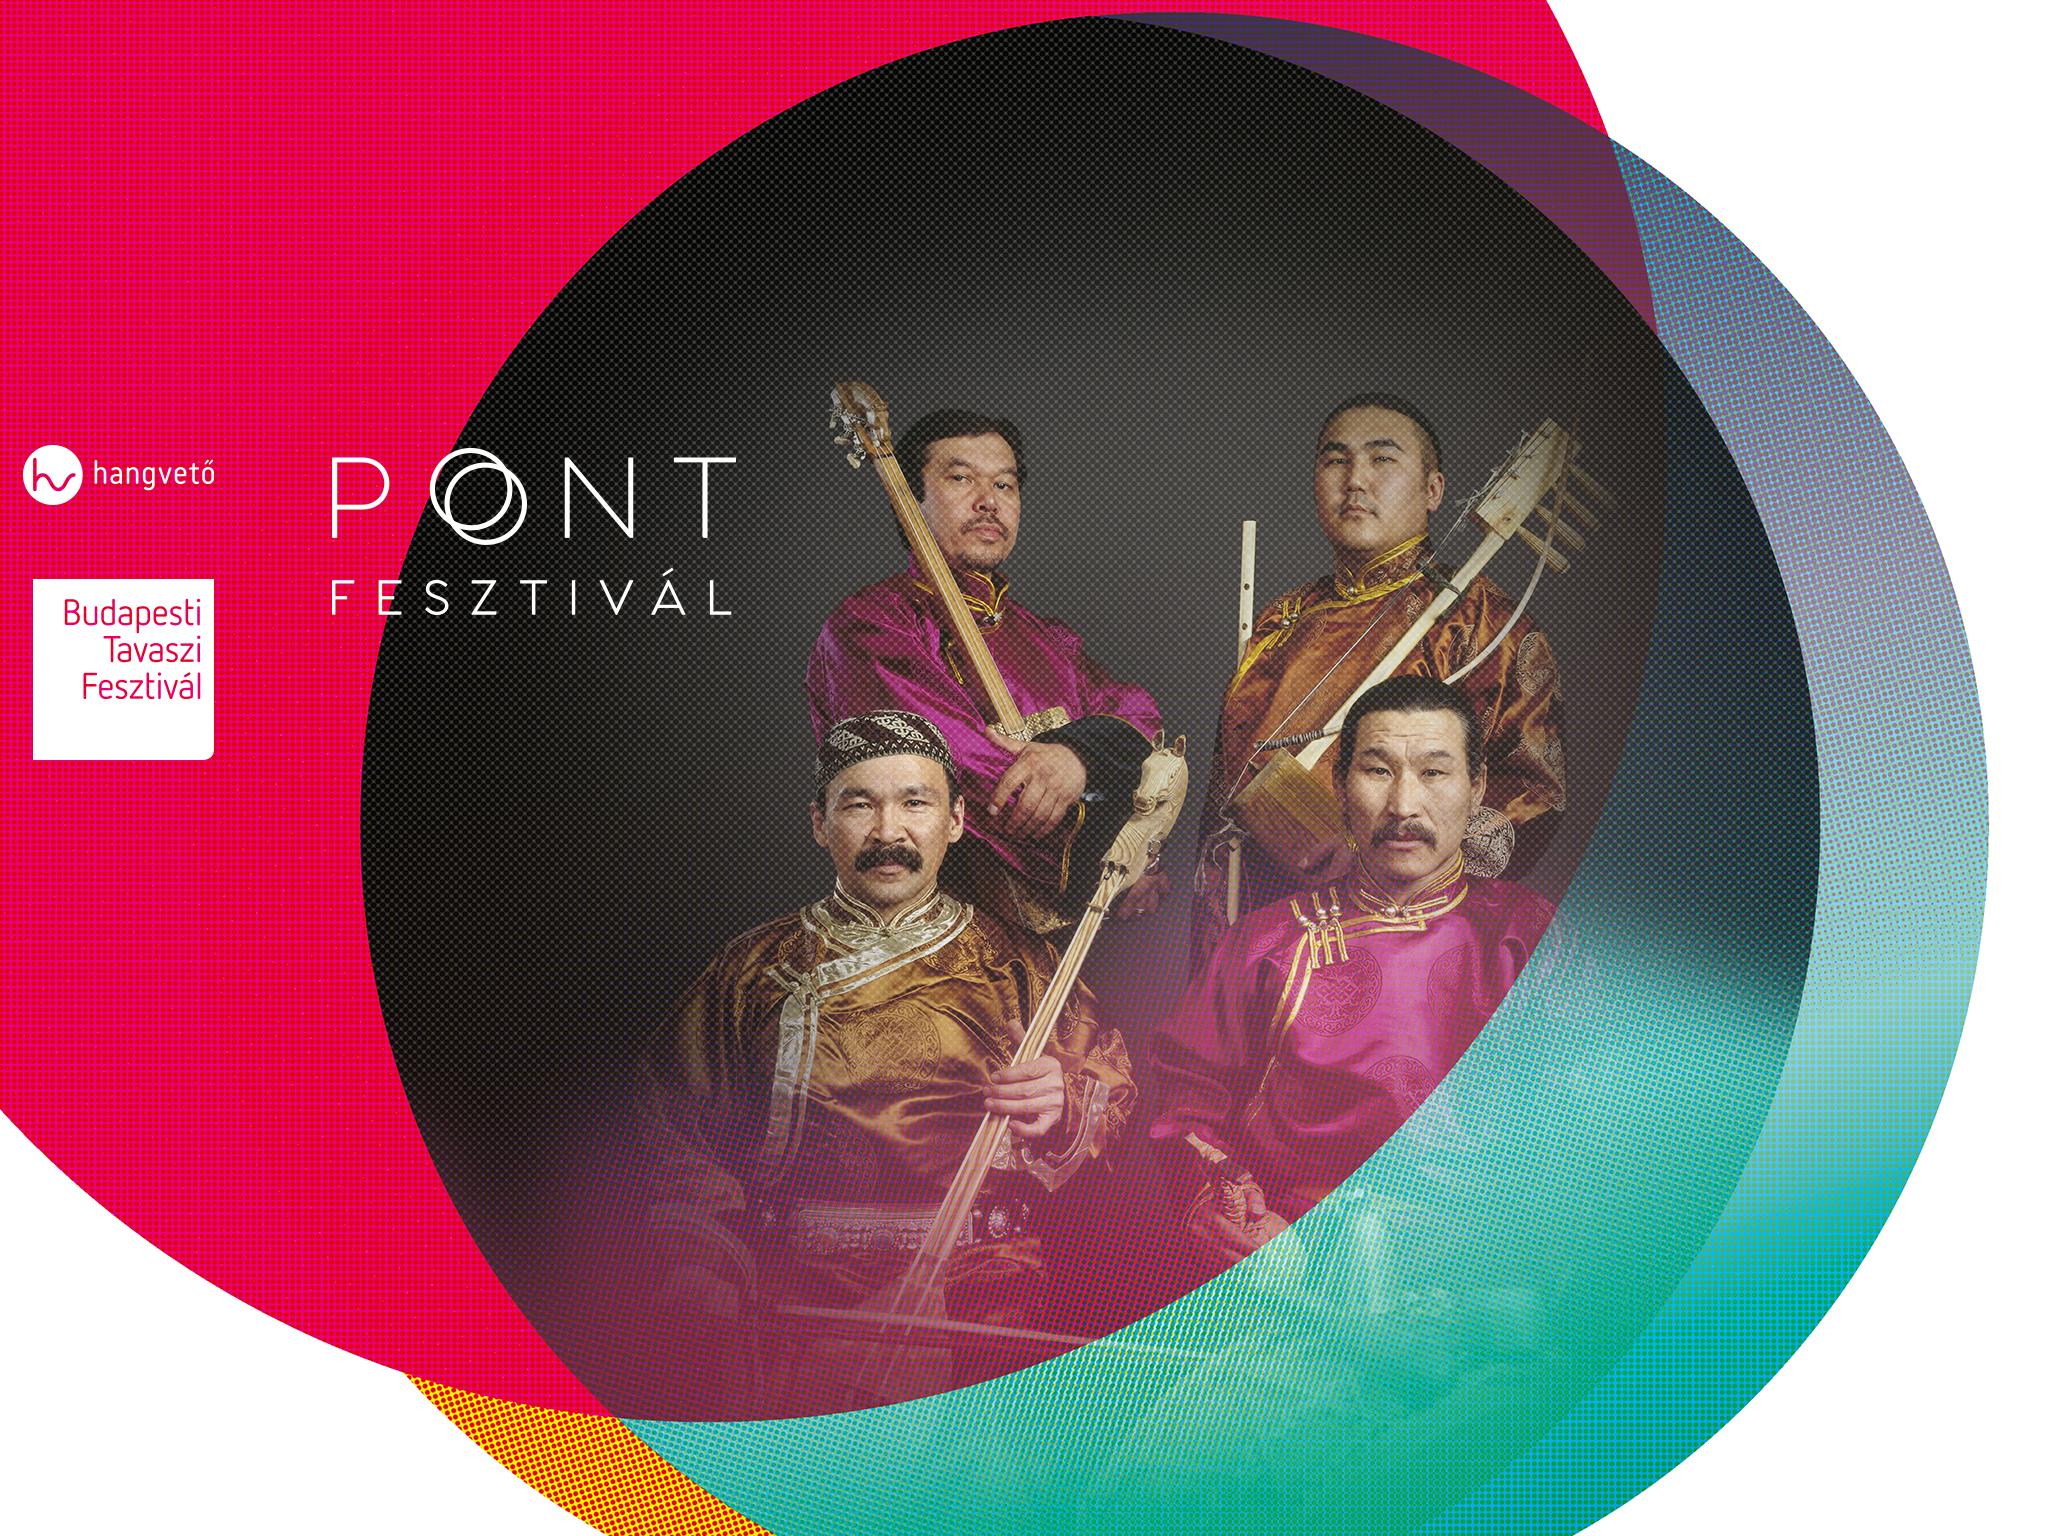 pont_huun_fb_event_c.jpg